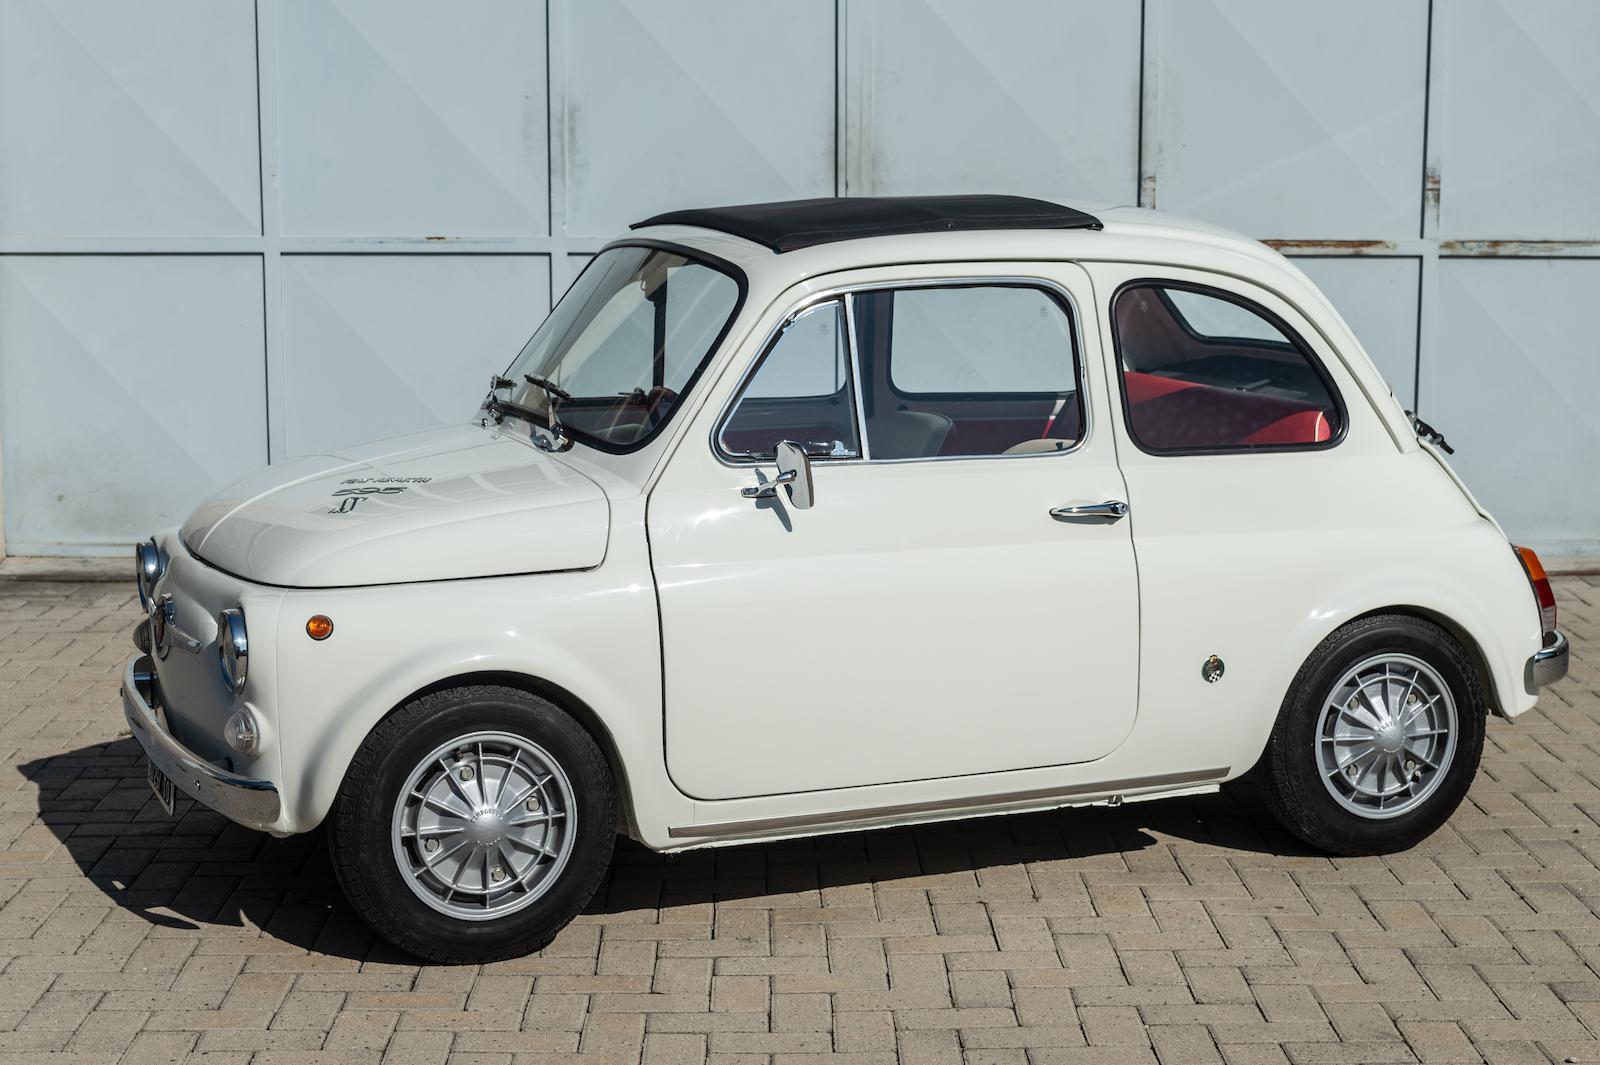 1967 Fiat-Abarth 595 SS